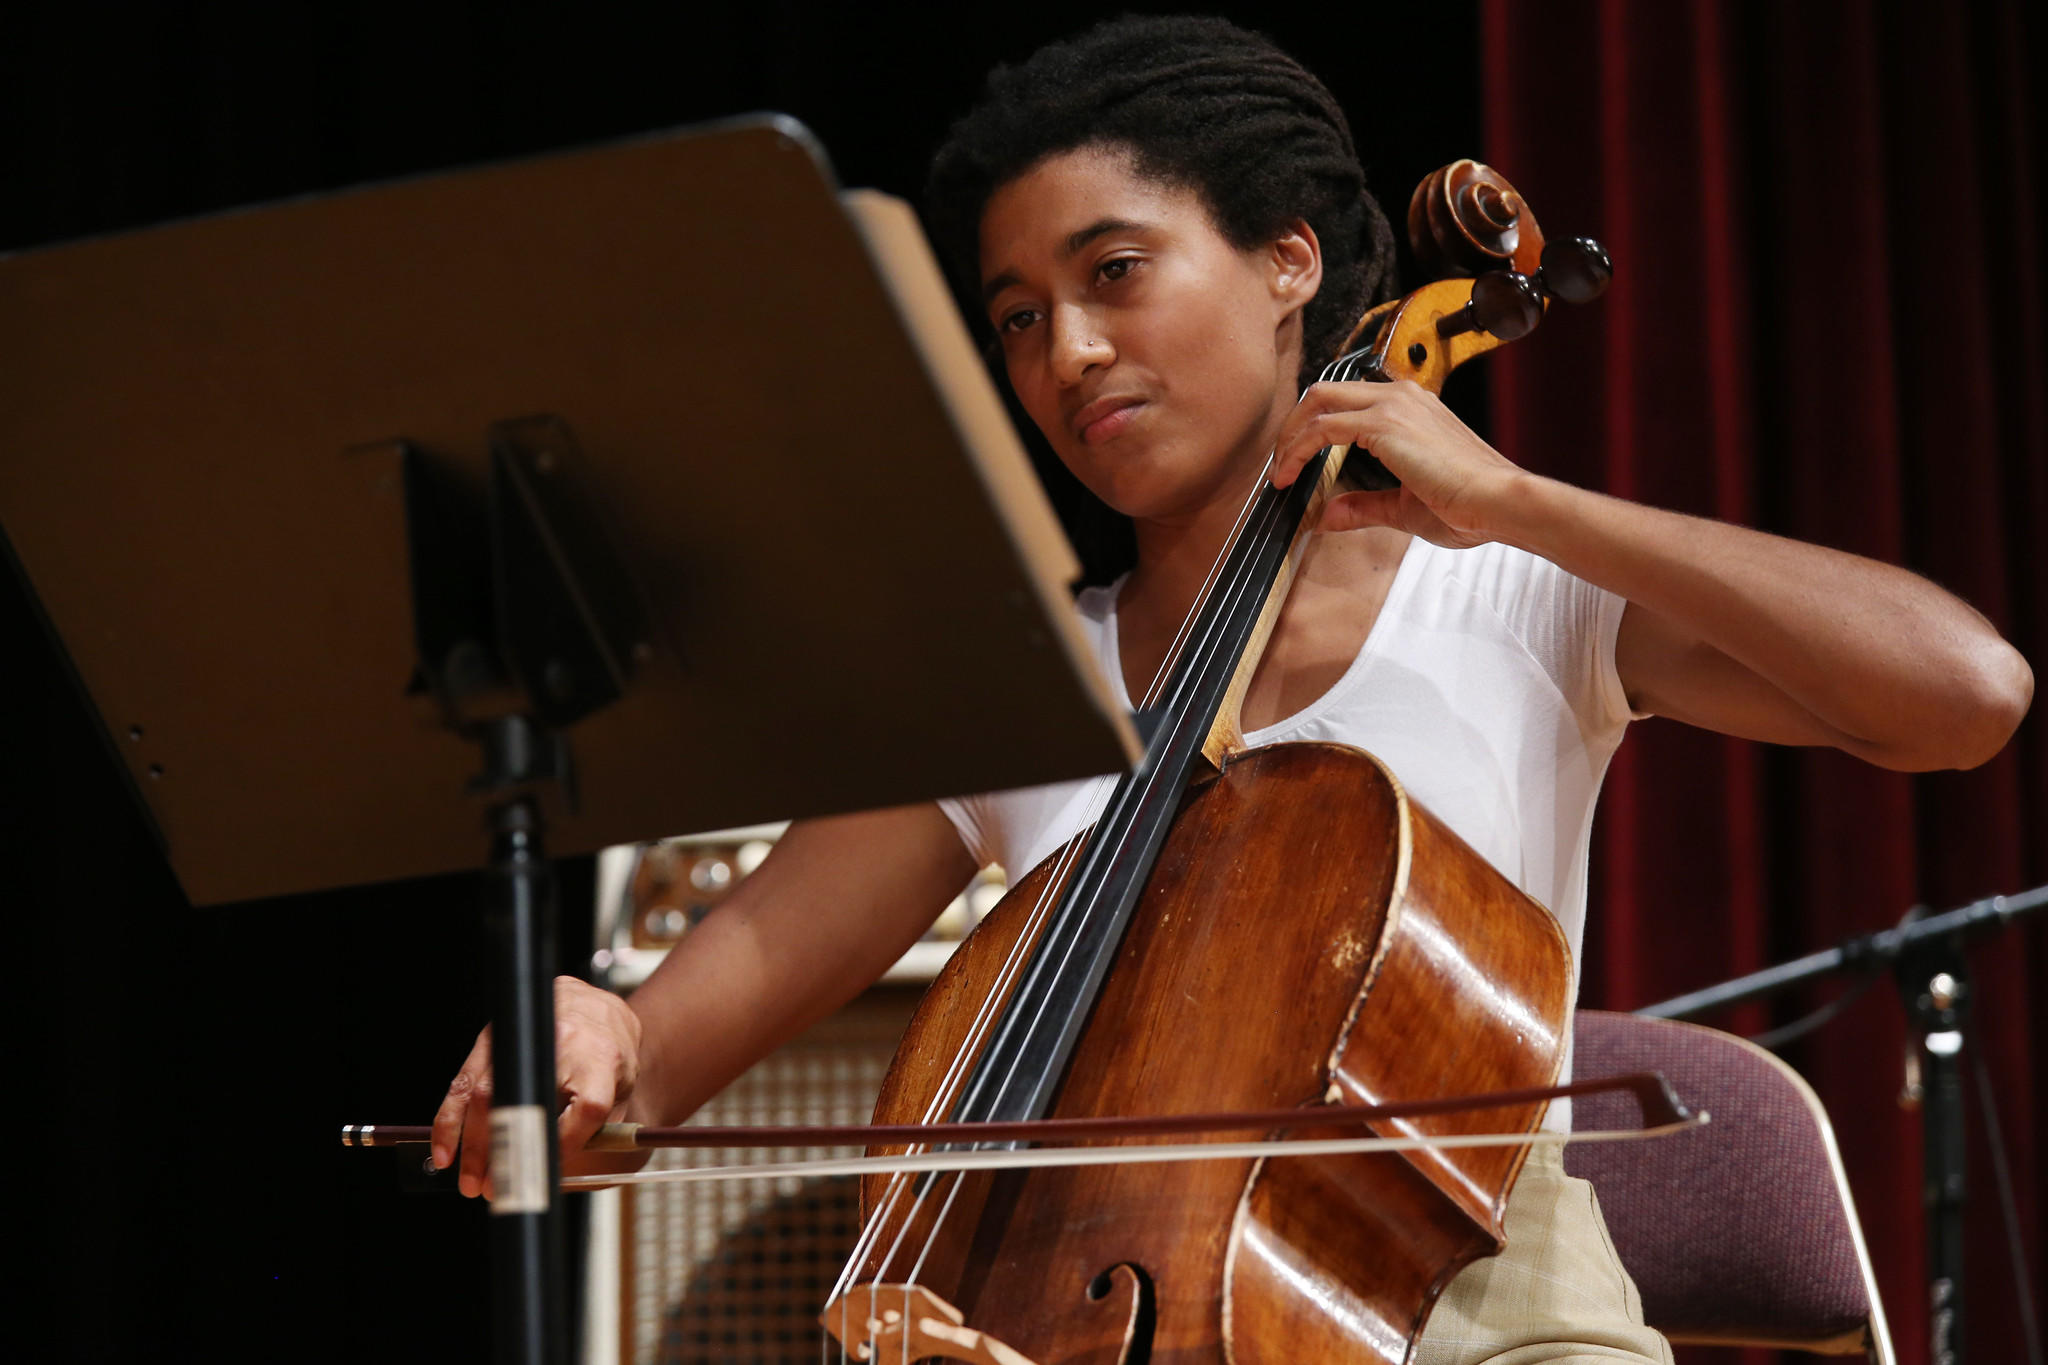 Cellist Tomeka Reid performs with the Tomeka Reid Quartet during the 2013 Hyde Park Jazz Festival.